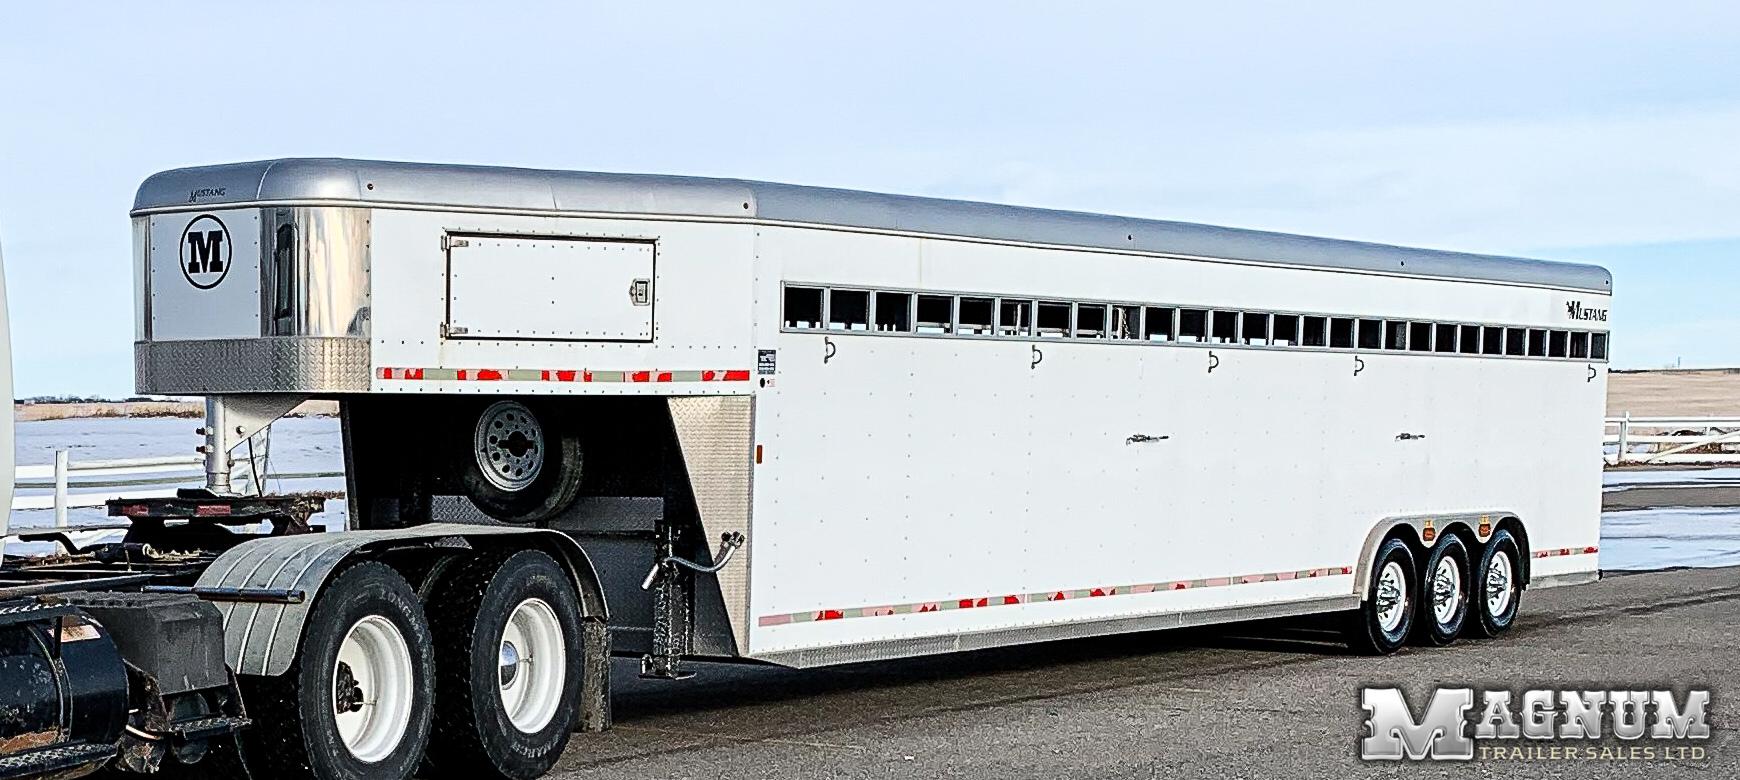 2014 Mustang 8′ x 36′ Gooseneck Stock Trailer